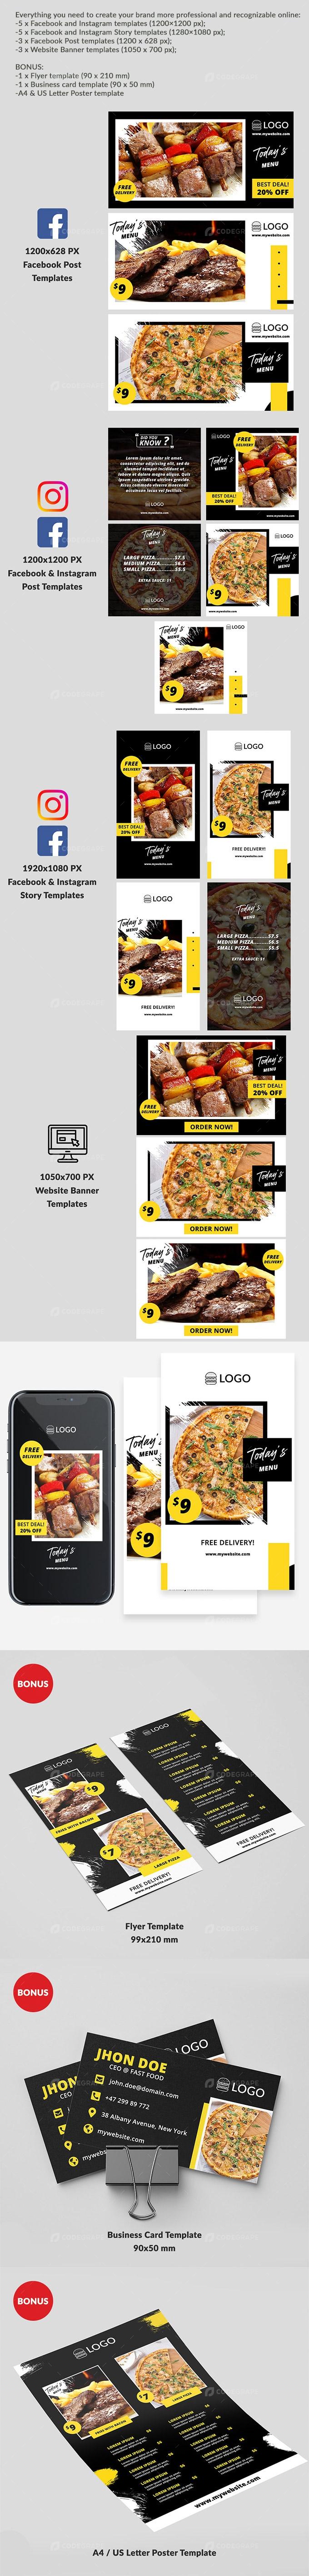 Fast Food & Restaurant Promo Kit Templates